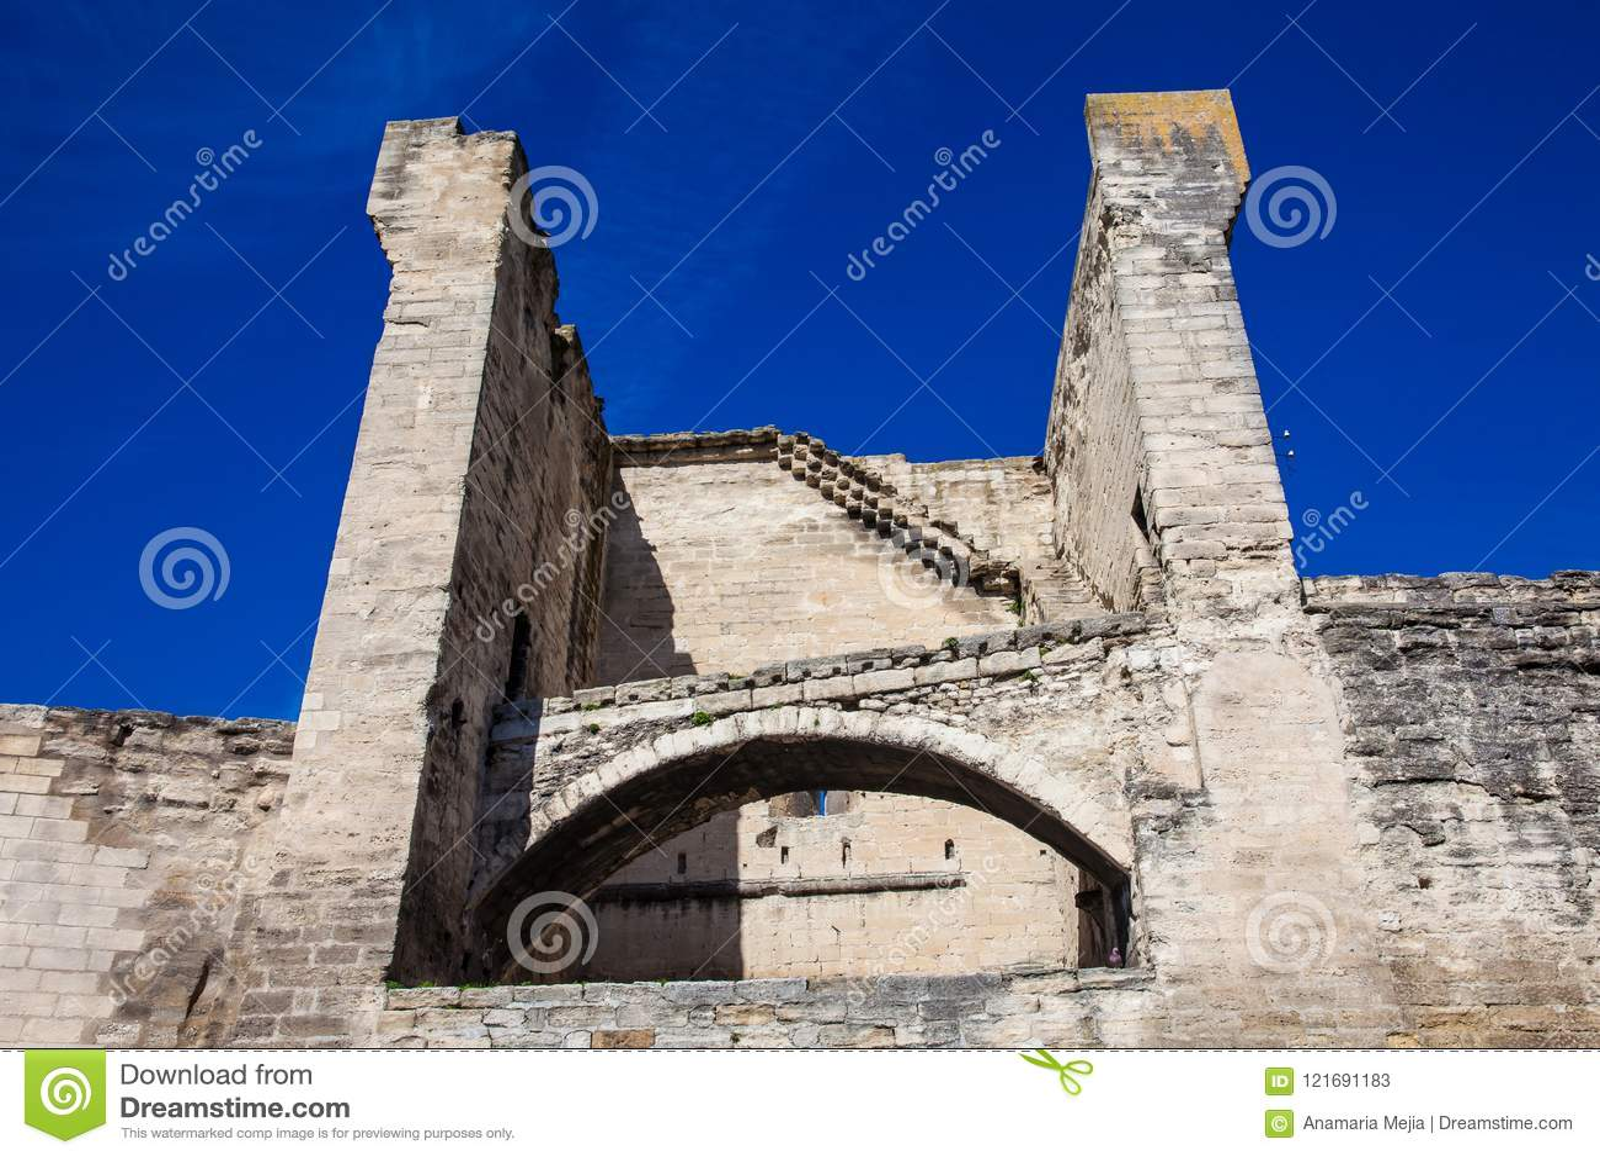 Medieval built Avignon city stone wall